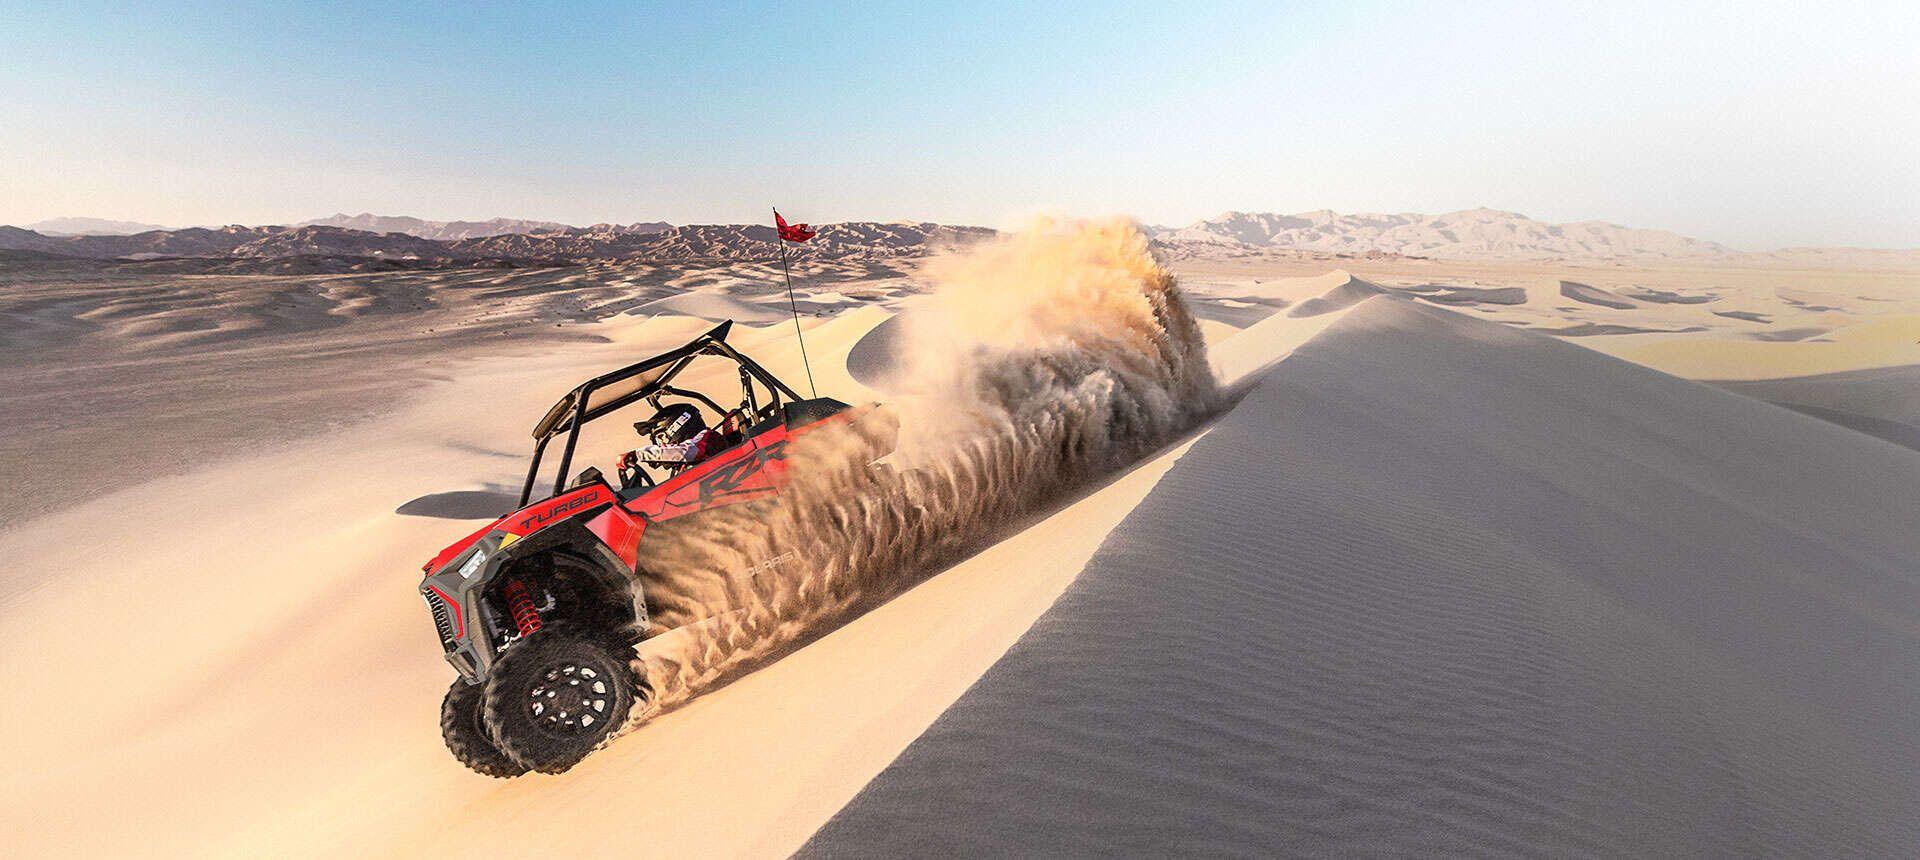 Мотовездеход Polaris RZR XP® Turbo Stealth Black 2020 - 12